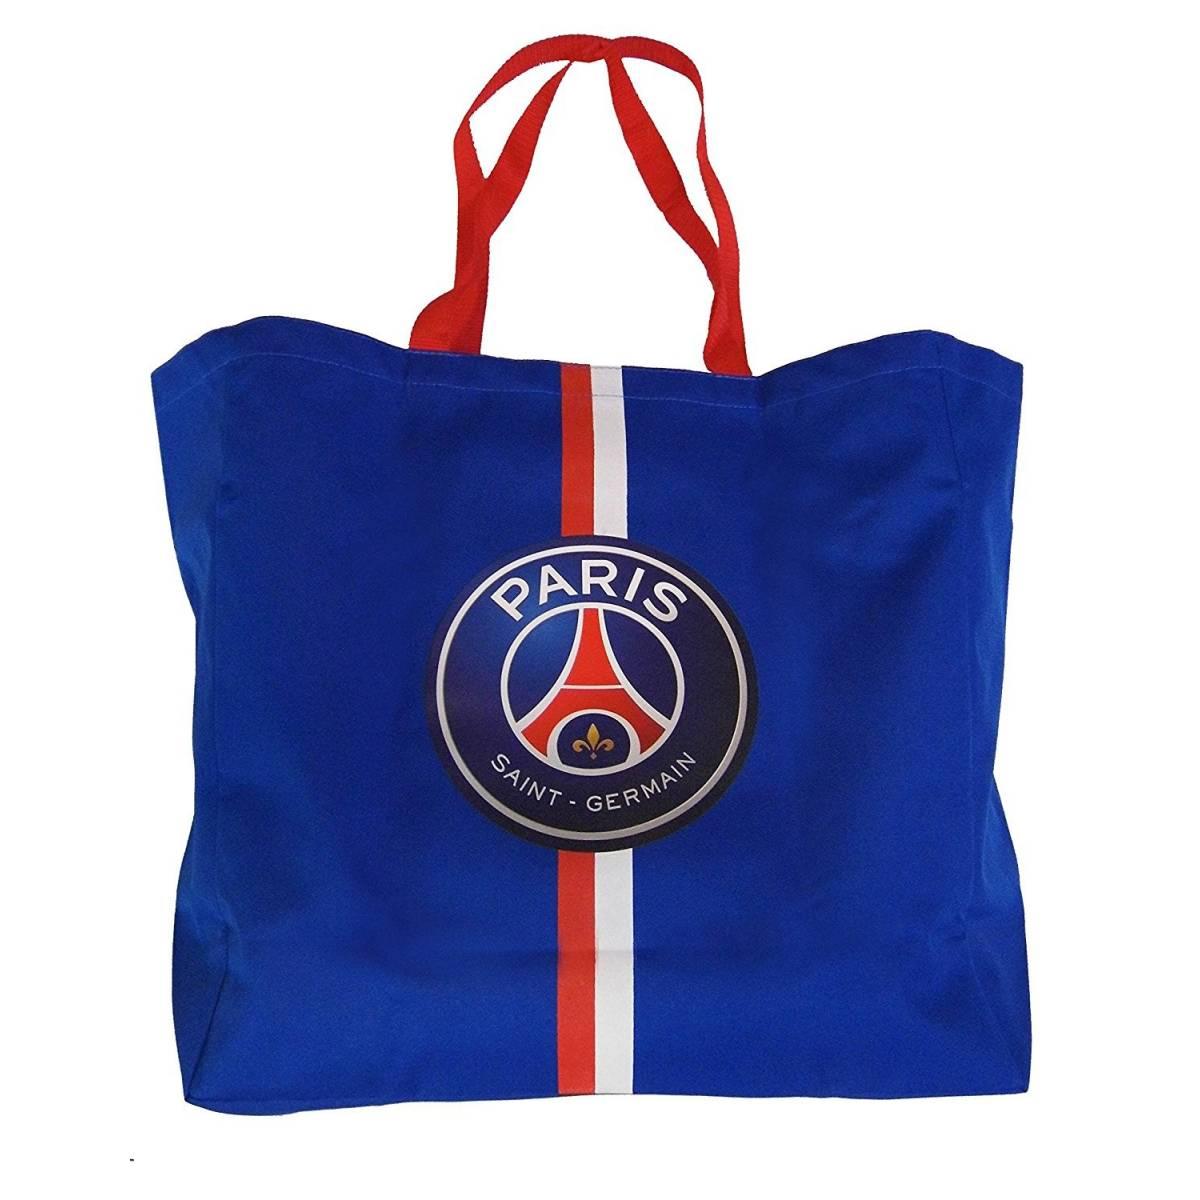 Sac Cabas Paris-Saint-Germain